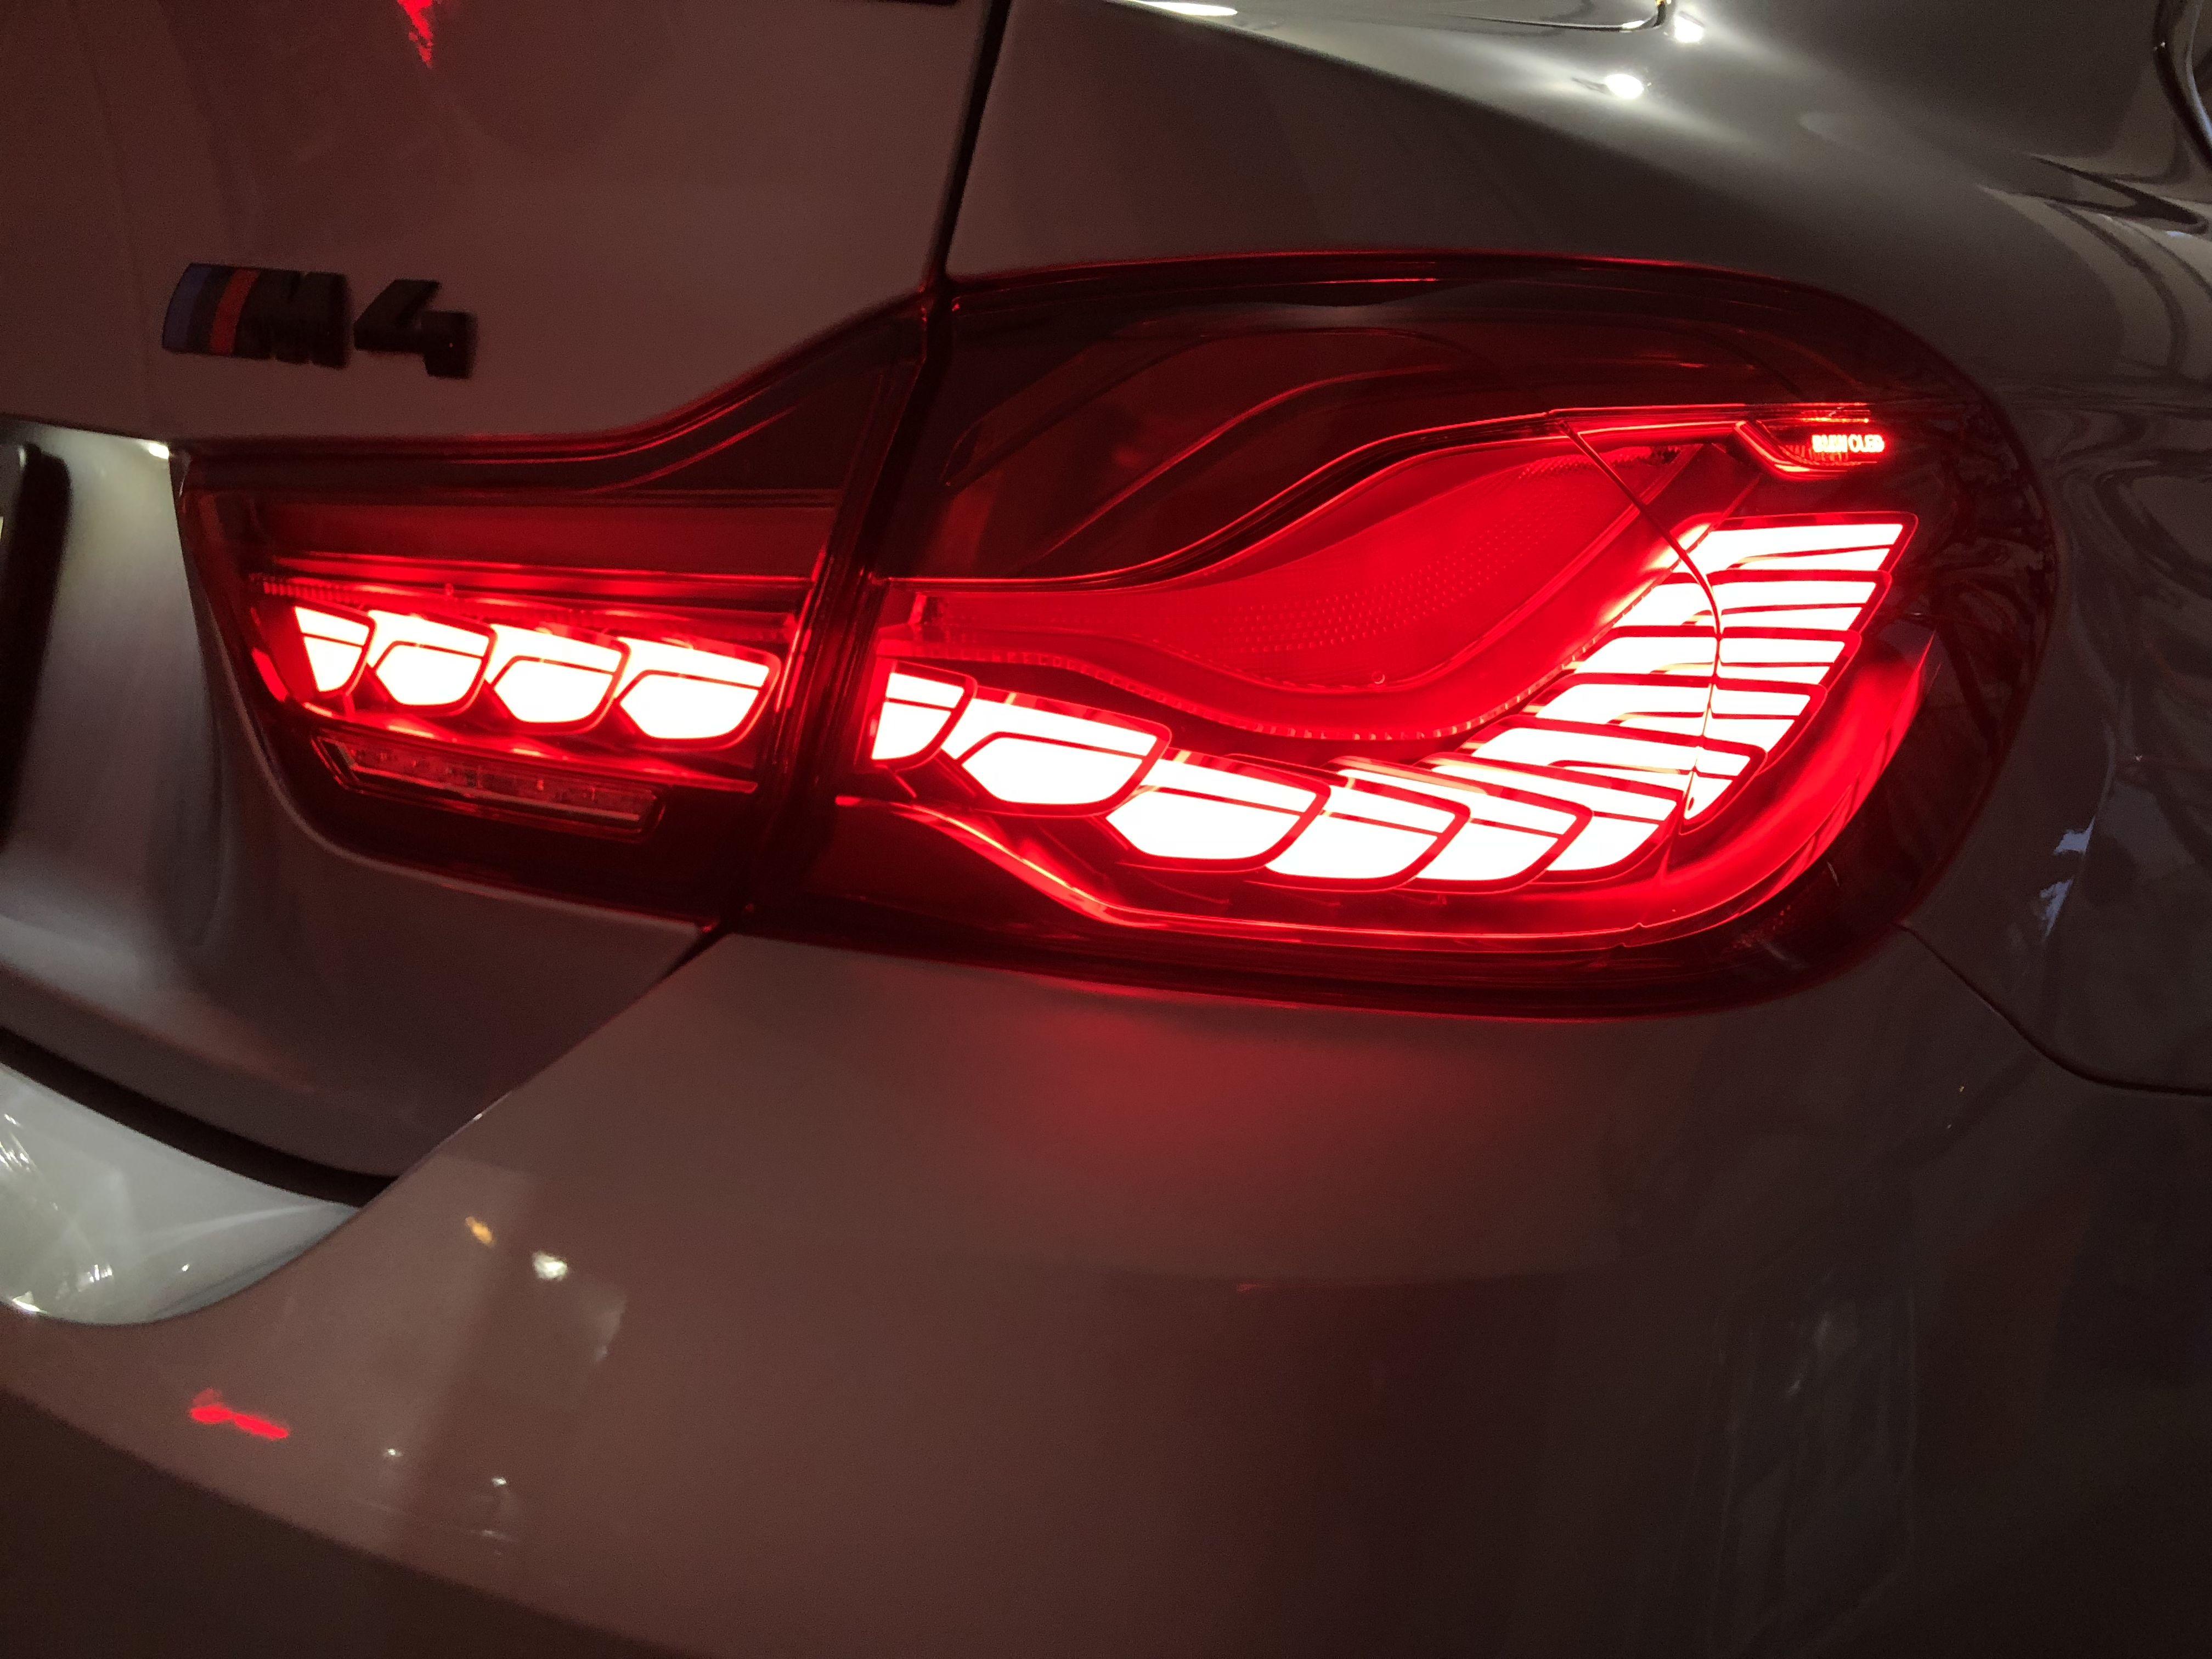 Bmw M4 Tail Light Upgrade To Gts Tail Lights Bmw M4 Bmw Tail